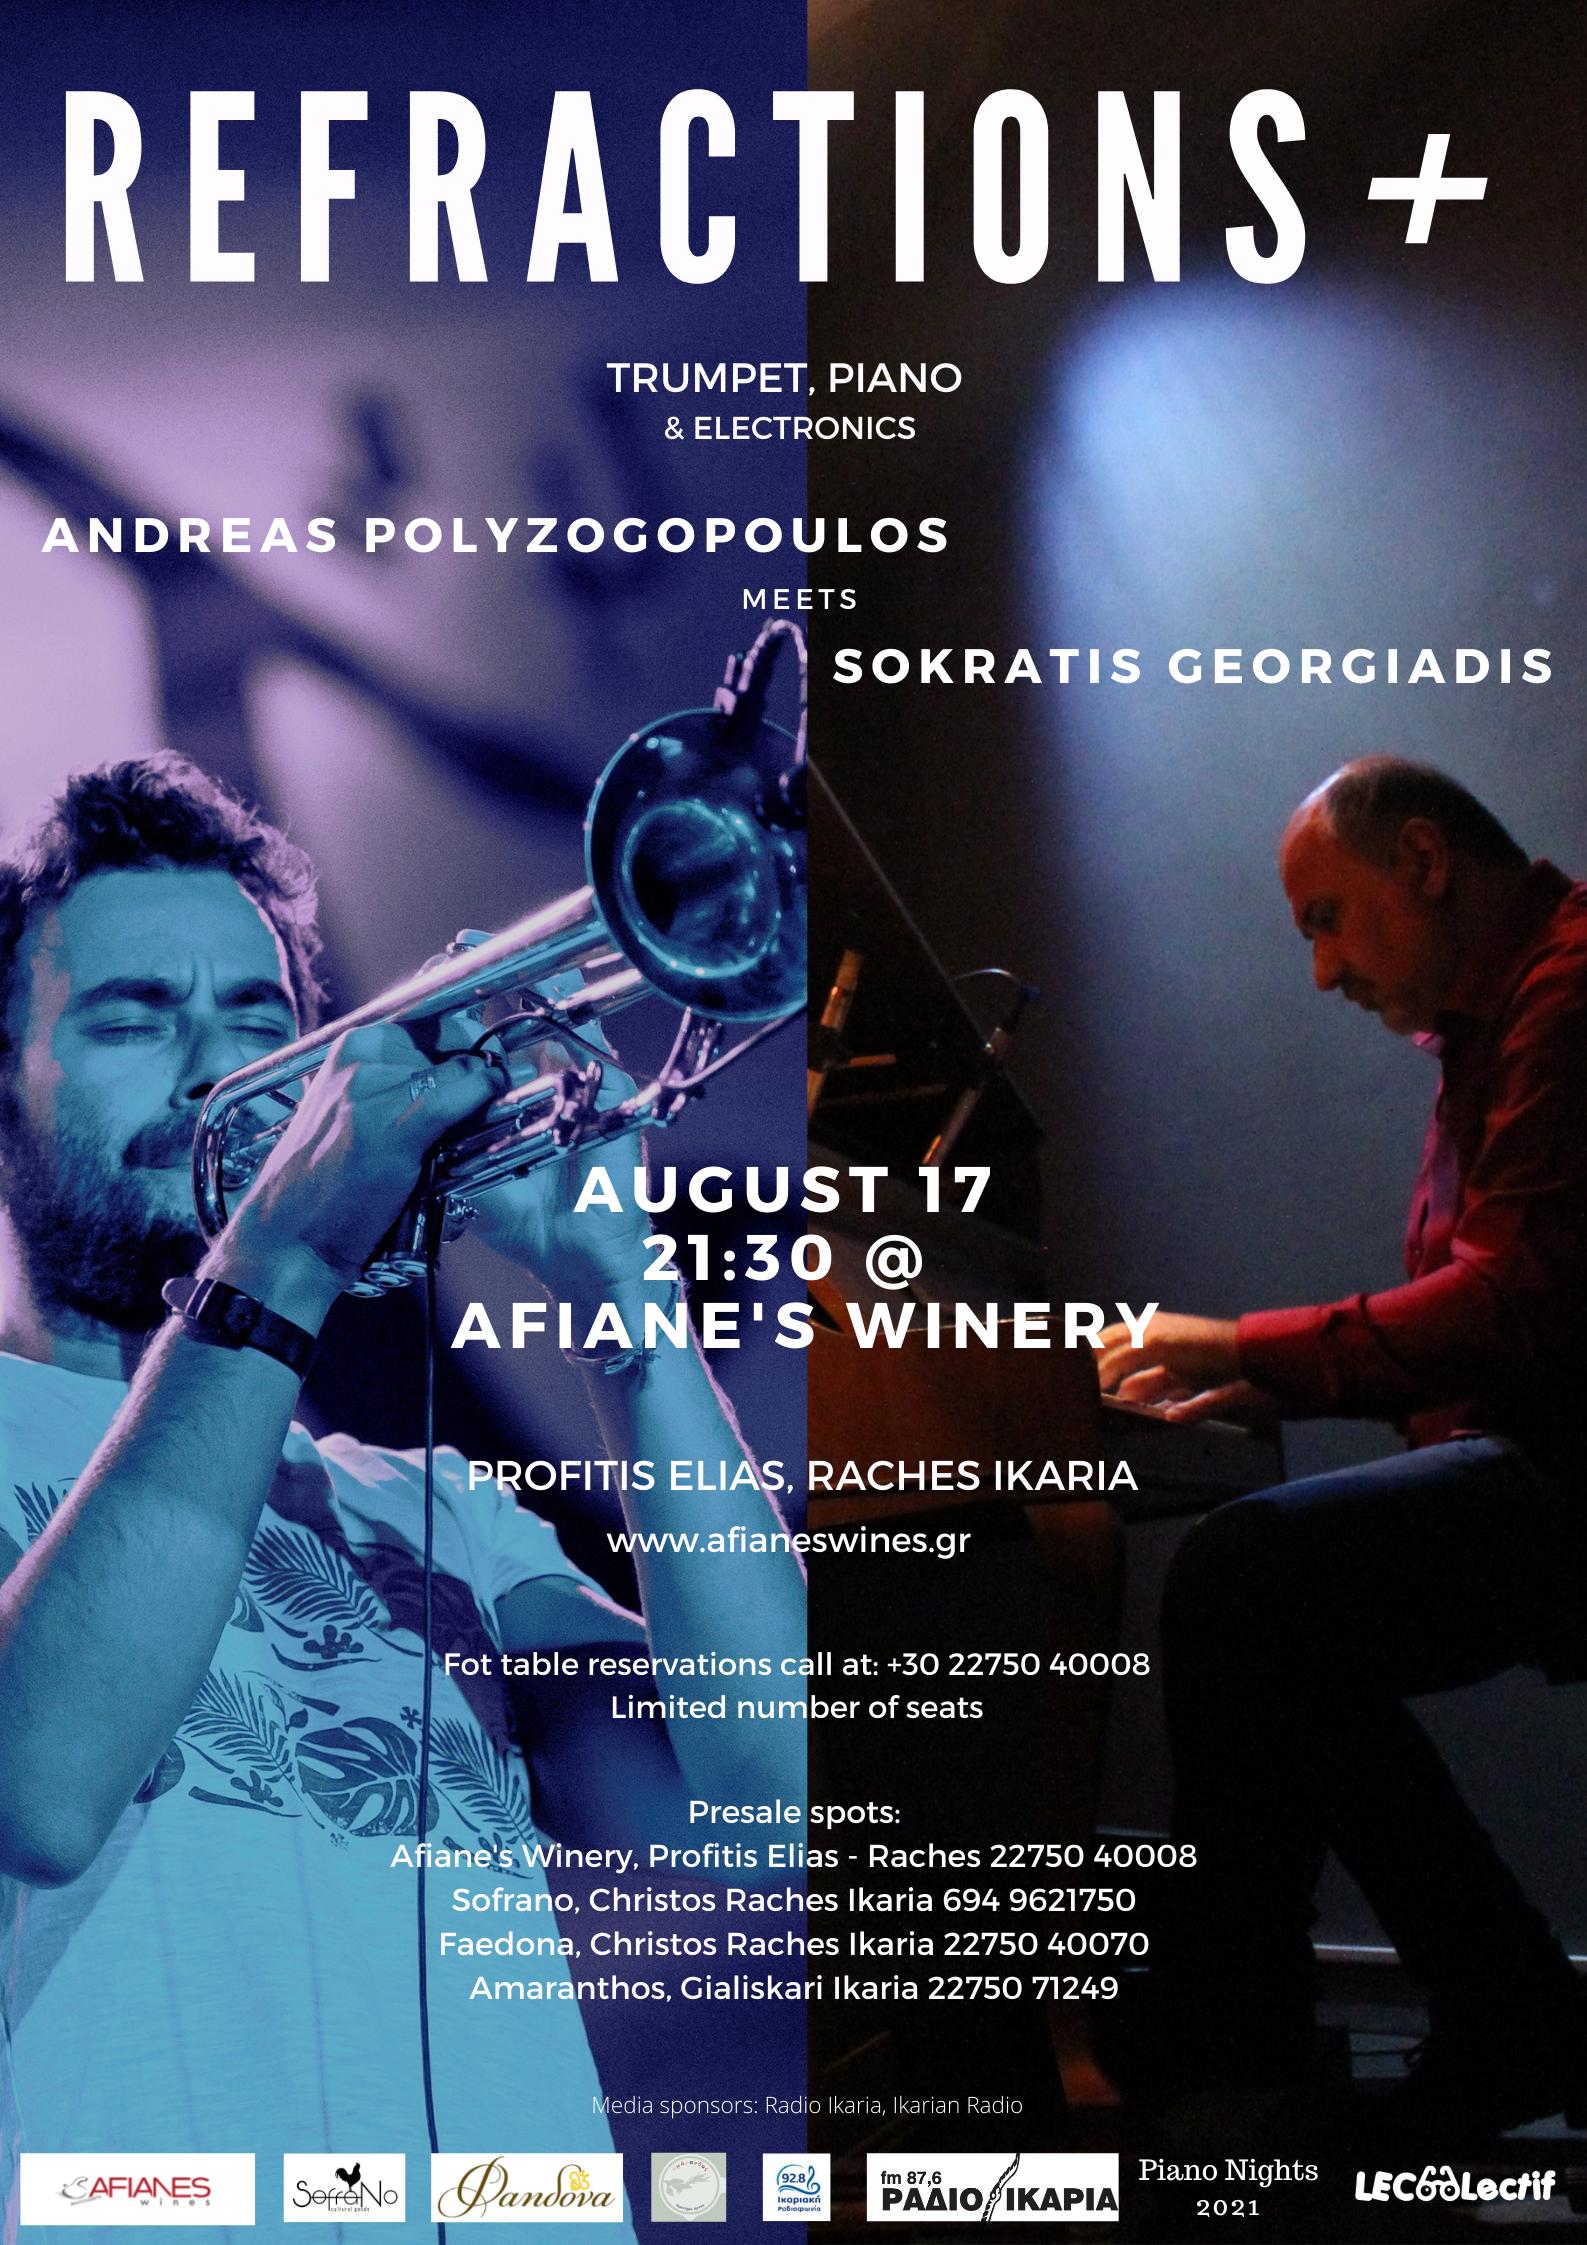 Refractions – Andreas Polyzogopoulos meets Socrates Georgiadis